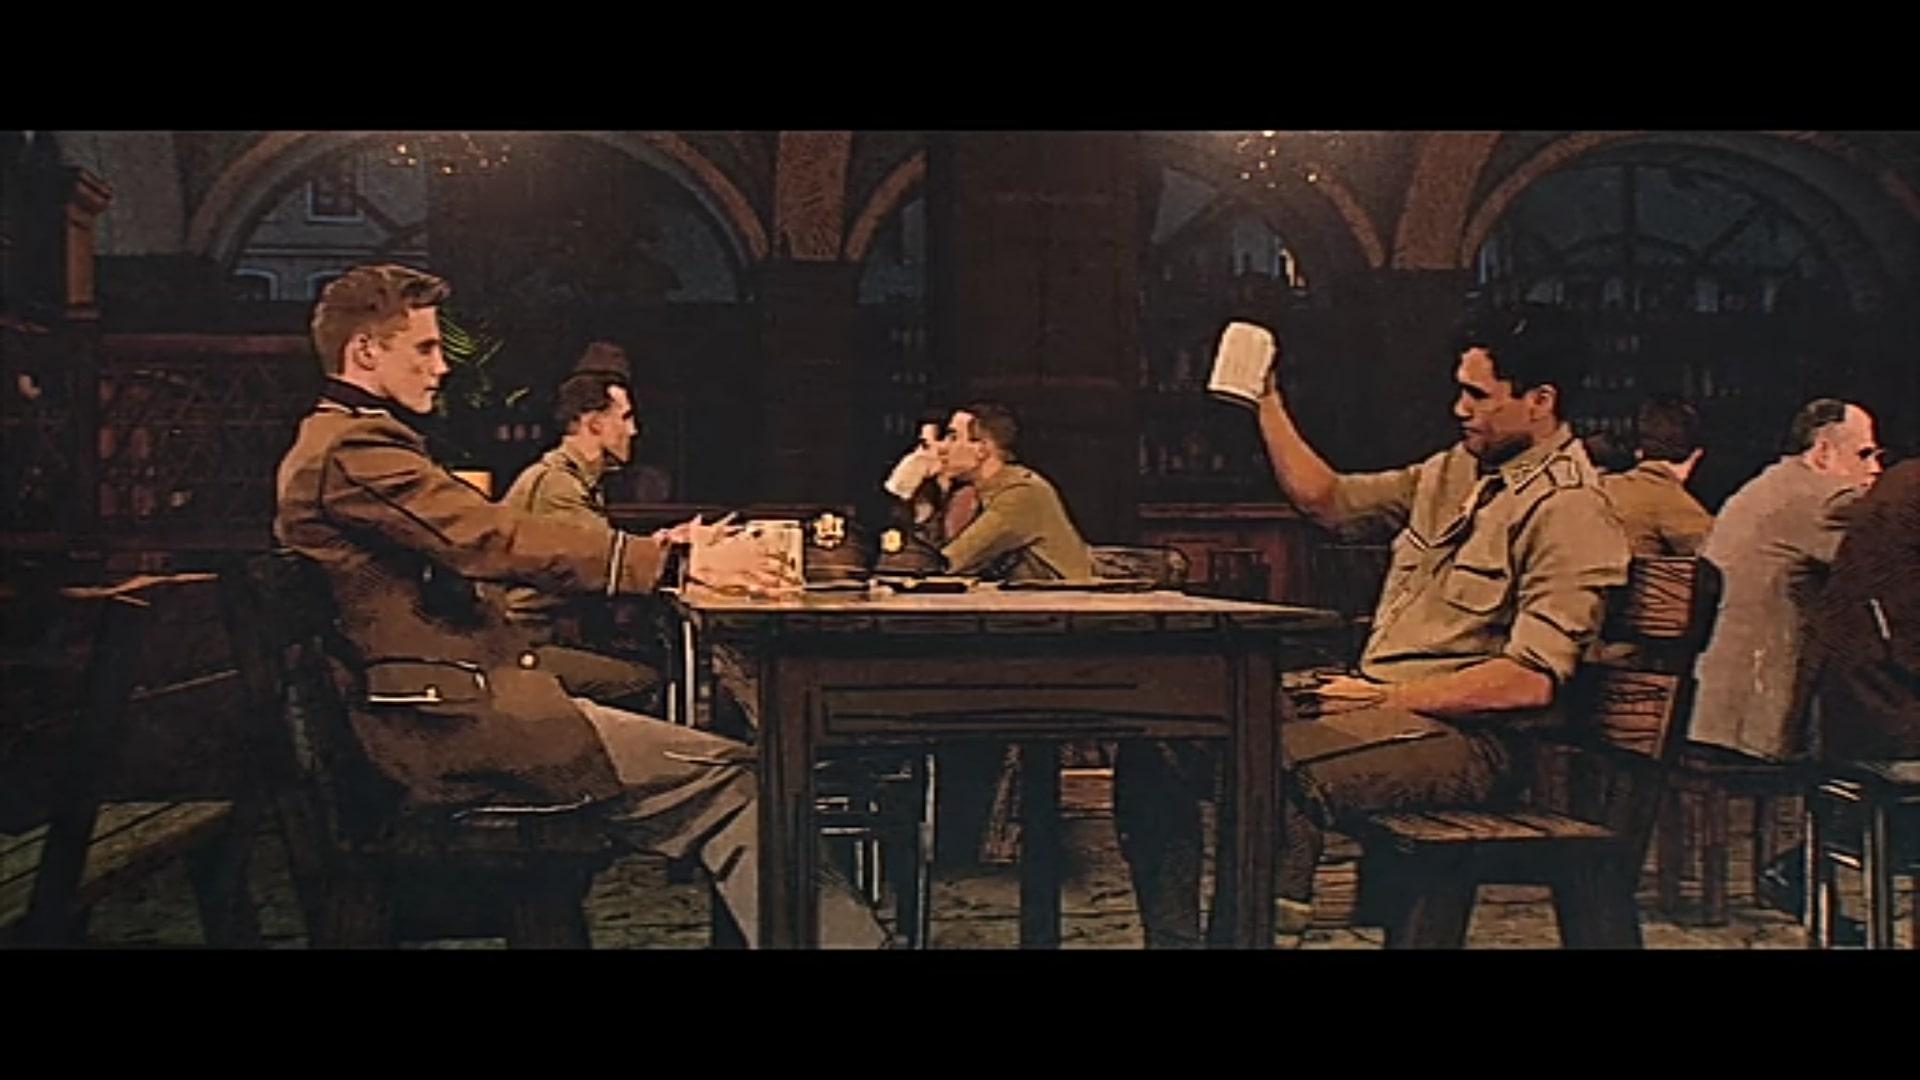 El final del Libertador, explicado   Sinopsis de la trama de Netflix 5